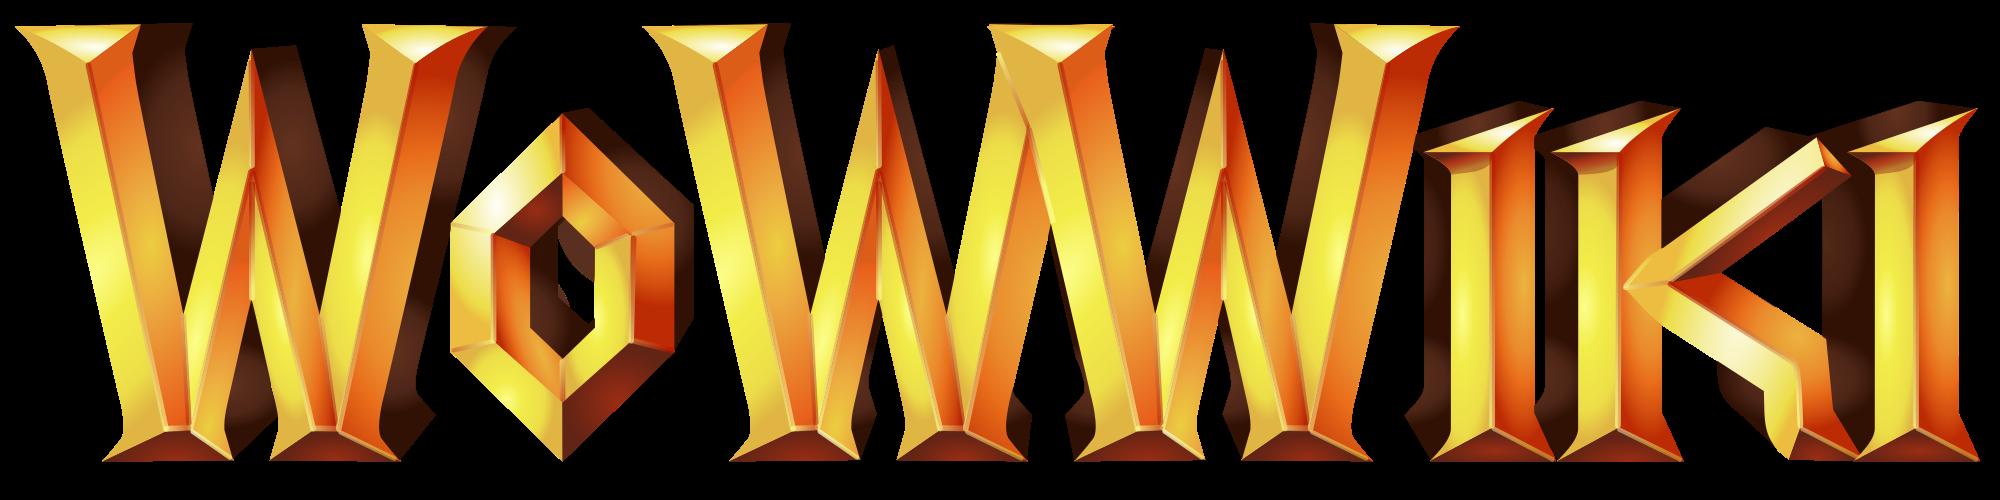 Wow clipart svg. File wowwiki logo wikimedia